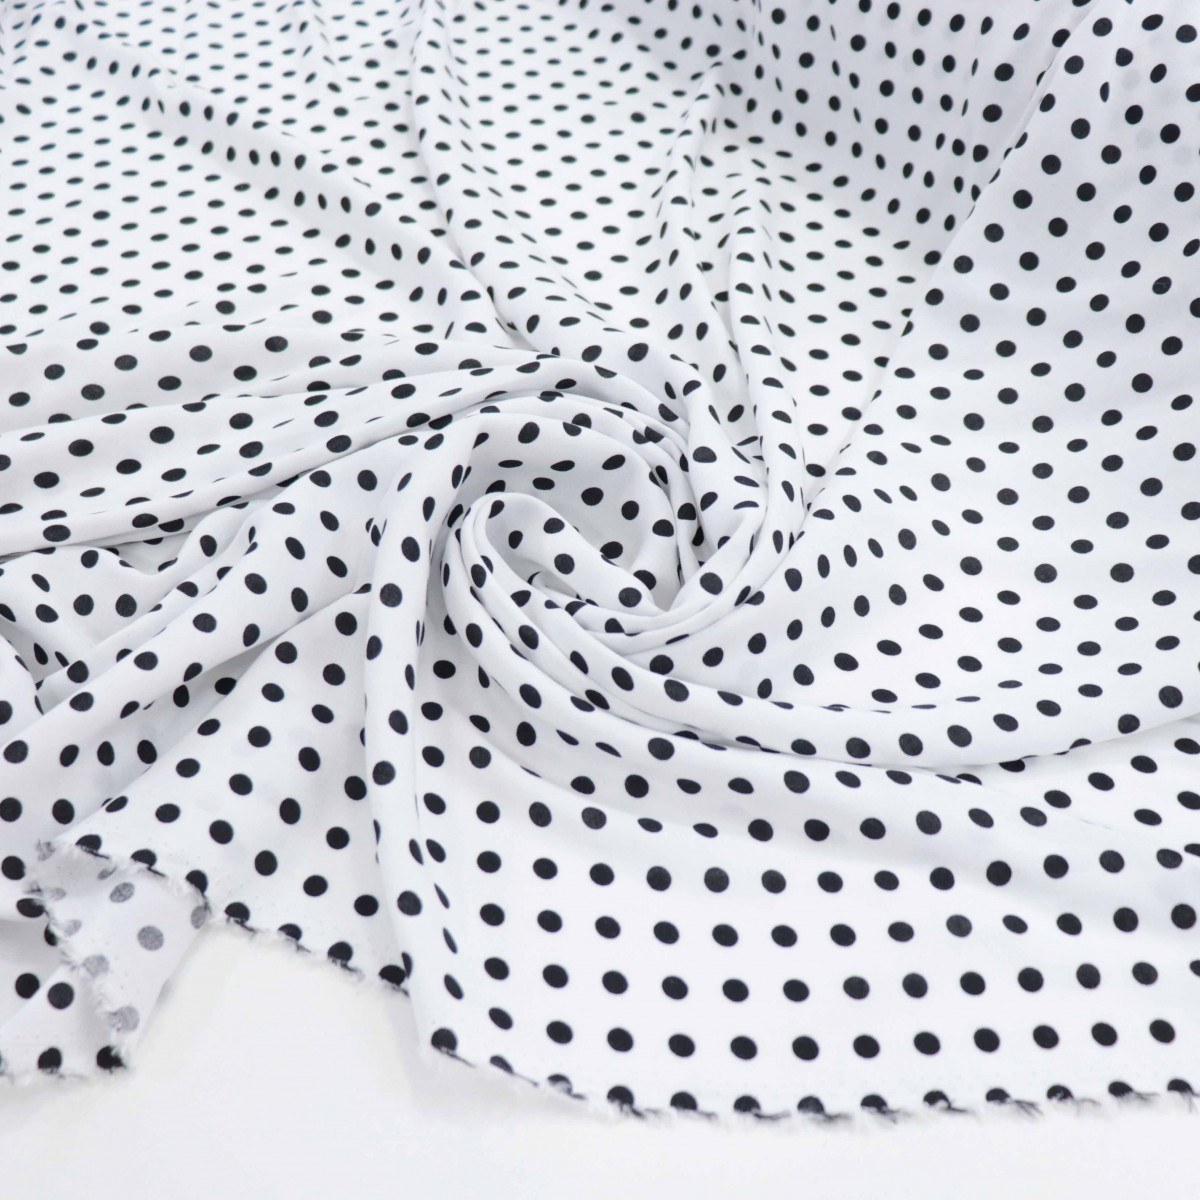 Tecido Viscose Poá Pequeno Branco e Preto